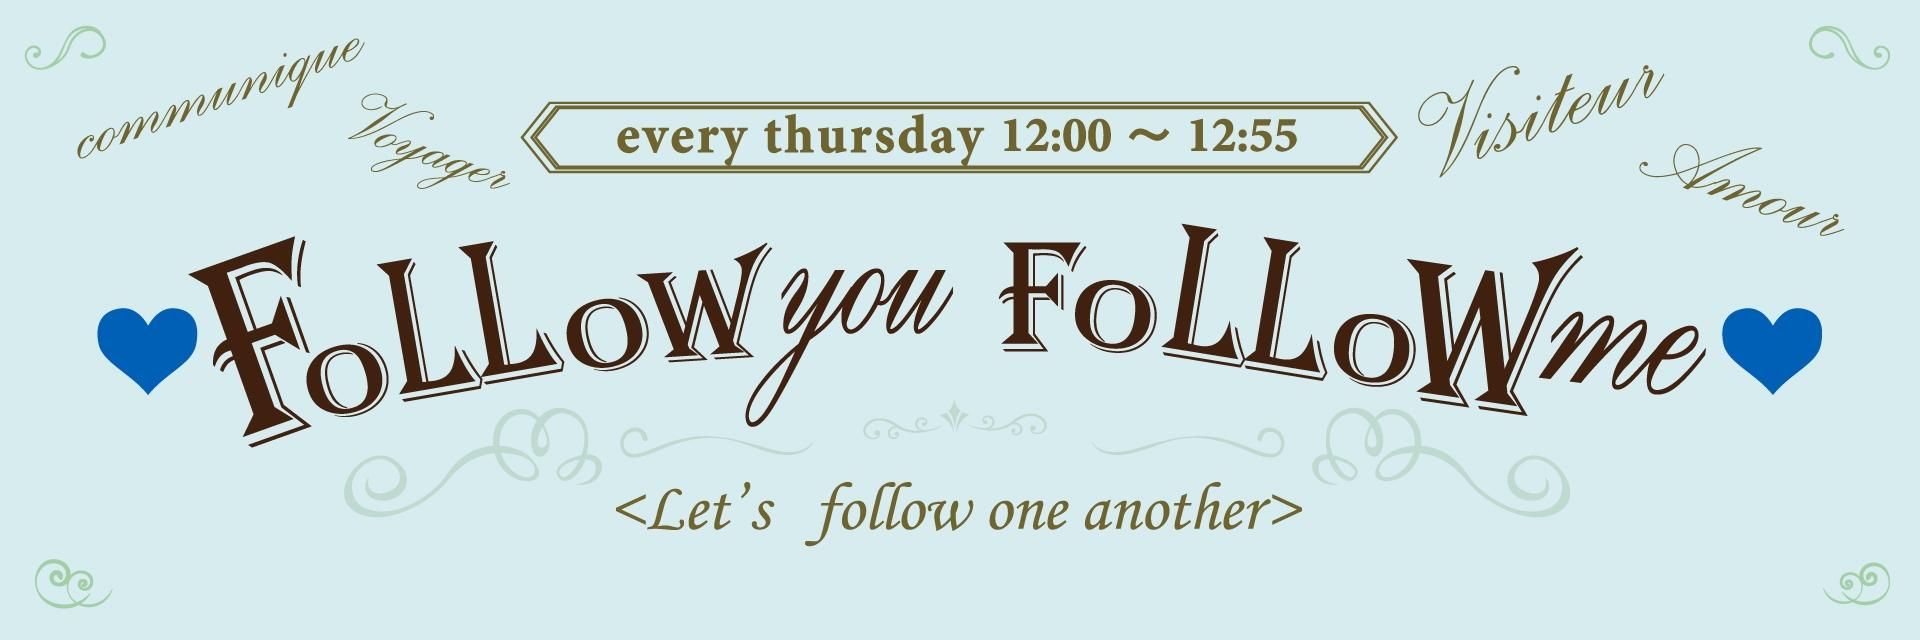 FM-NIIGATA 77.5MHz Follow you Follow me